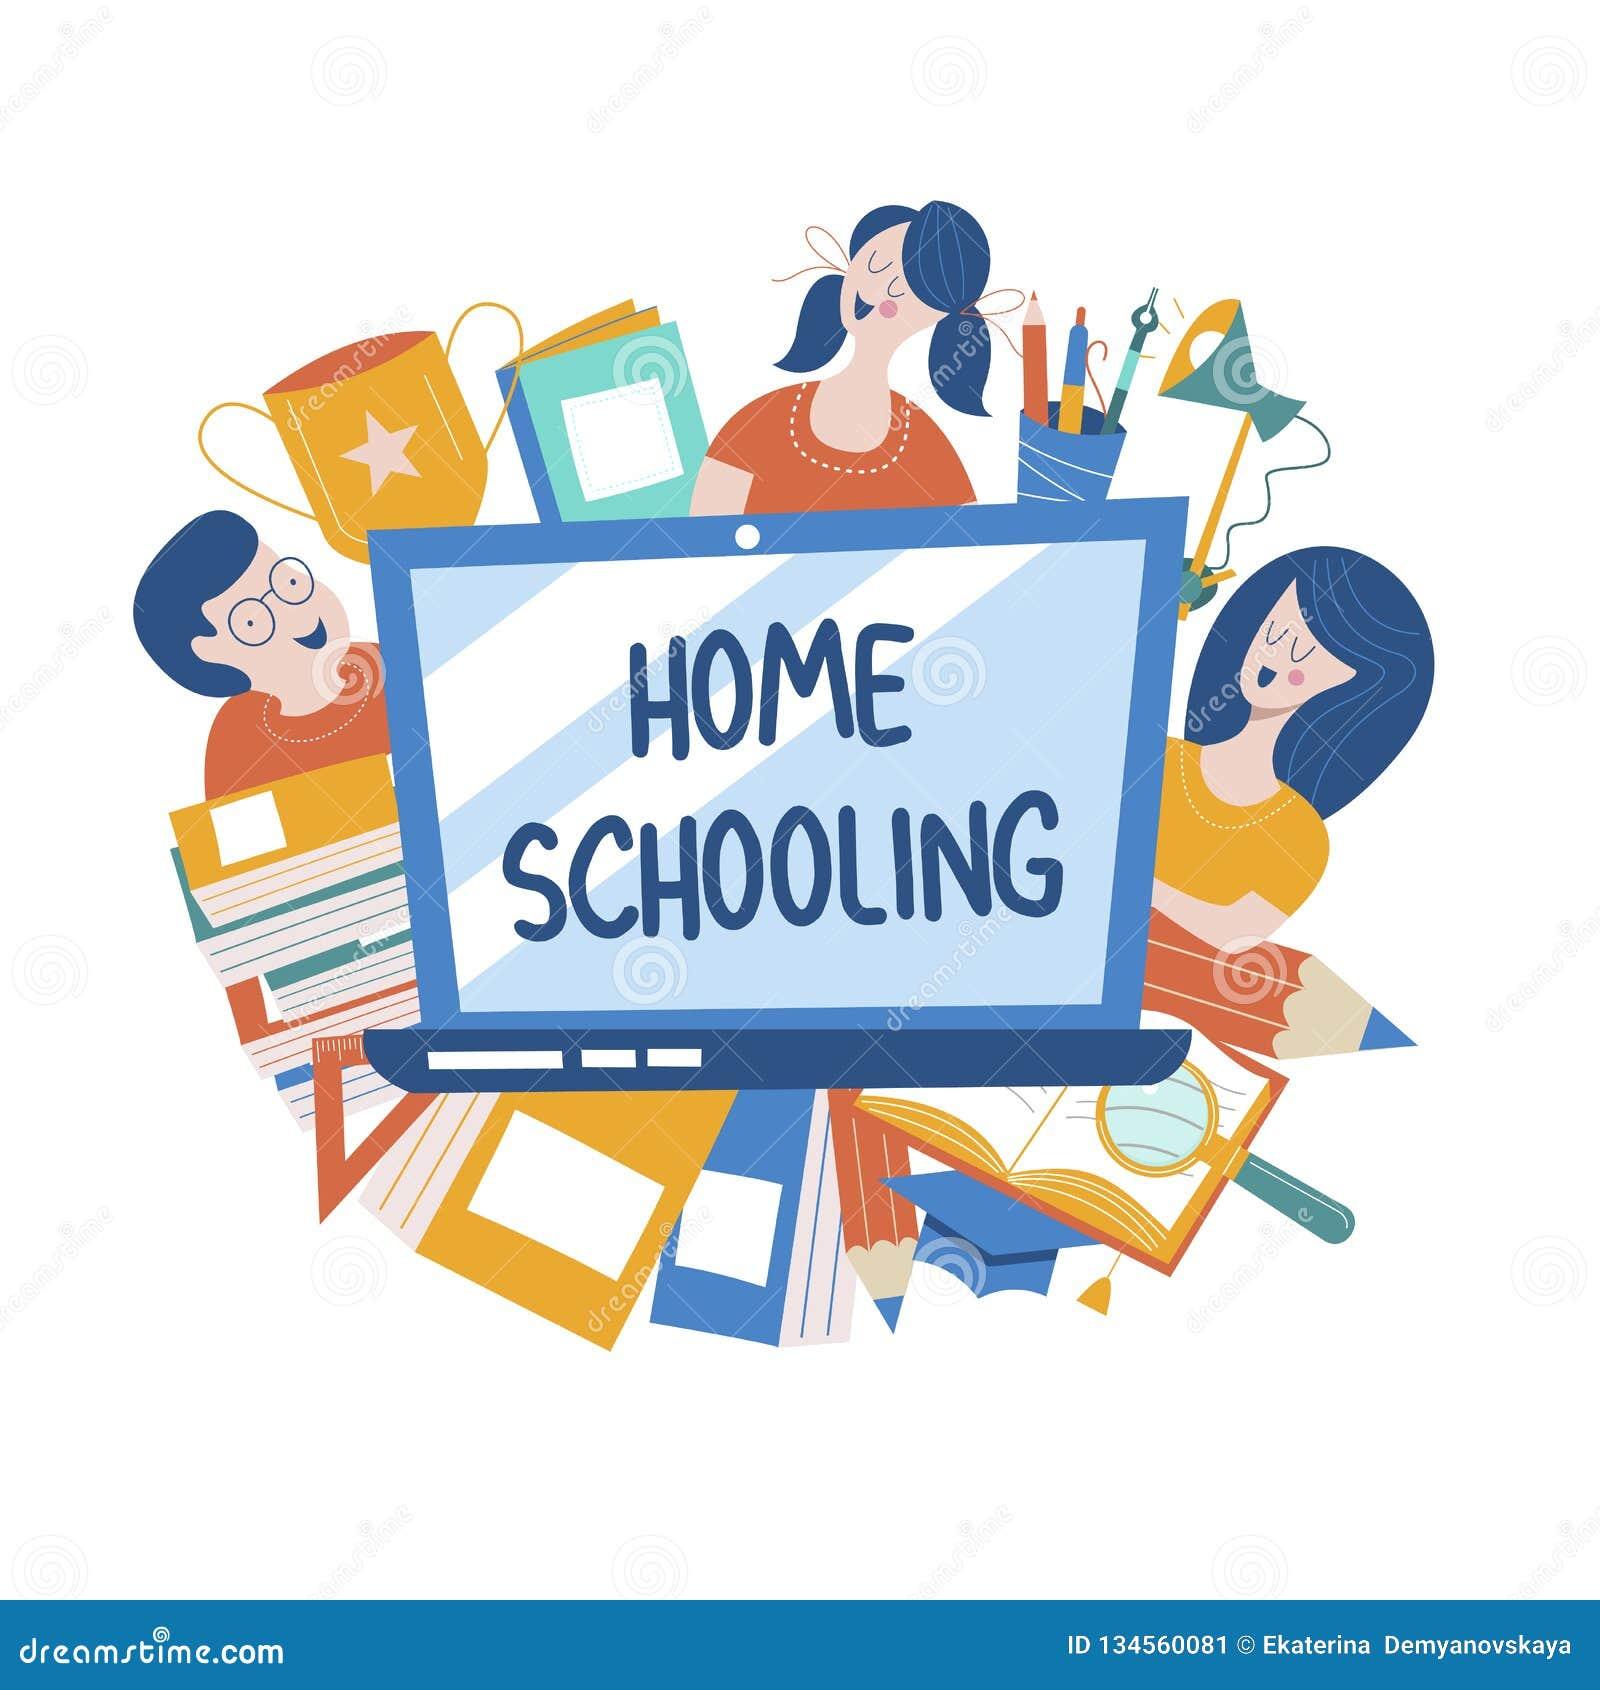 concept-homeschooling-emblem-home-schooling-large-families-vector-illustration-concept-home-schooling-134560081.jpg?profile=RESIZE_400x